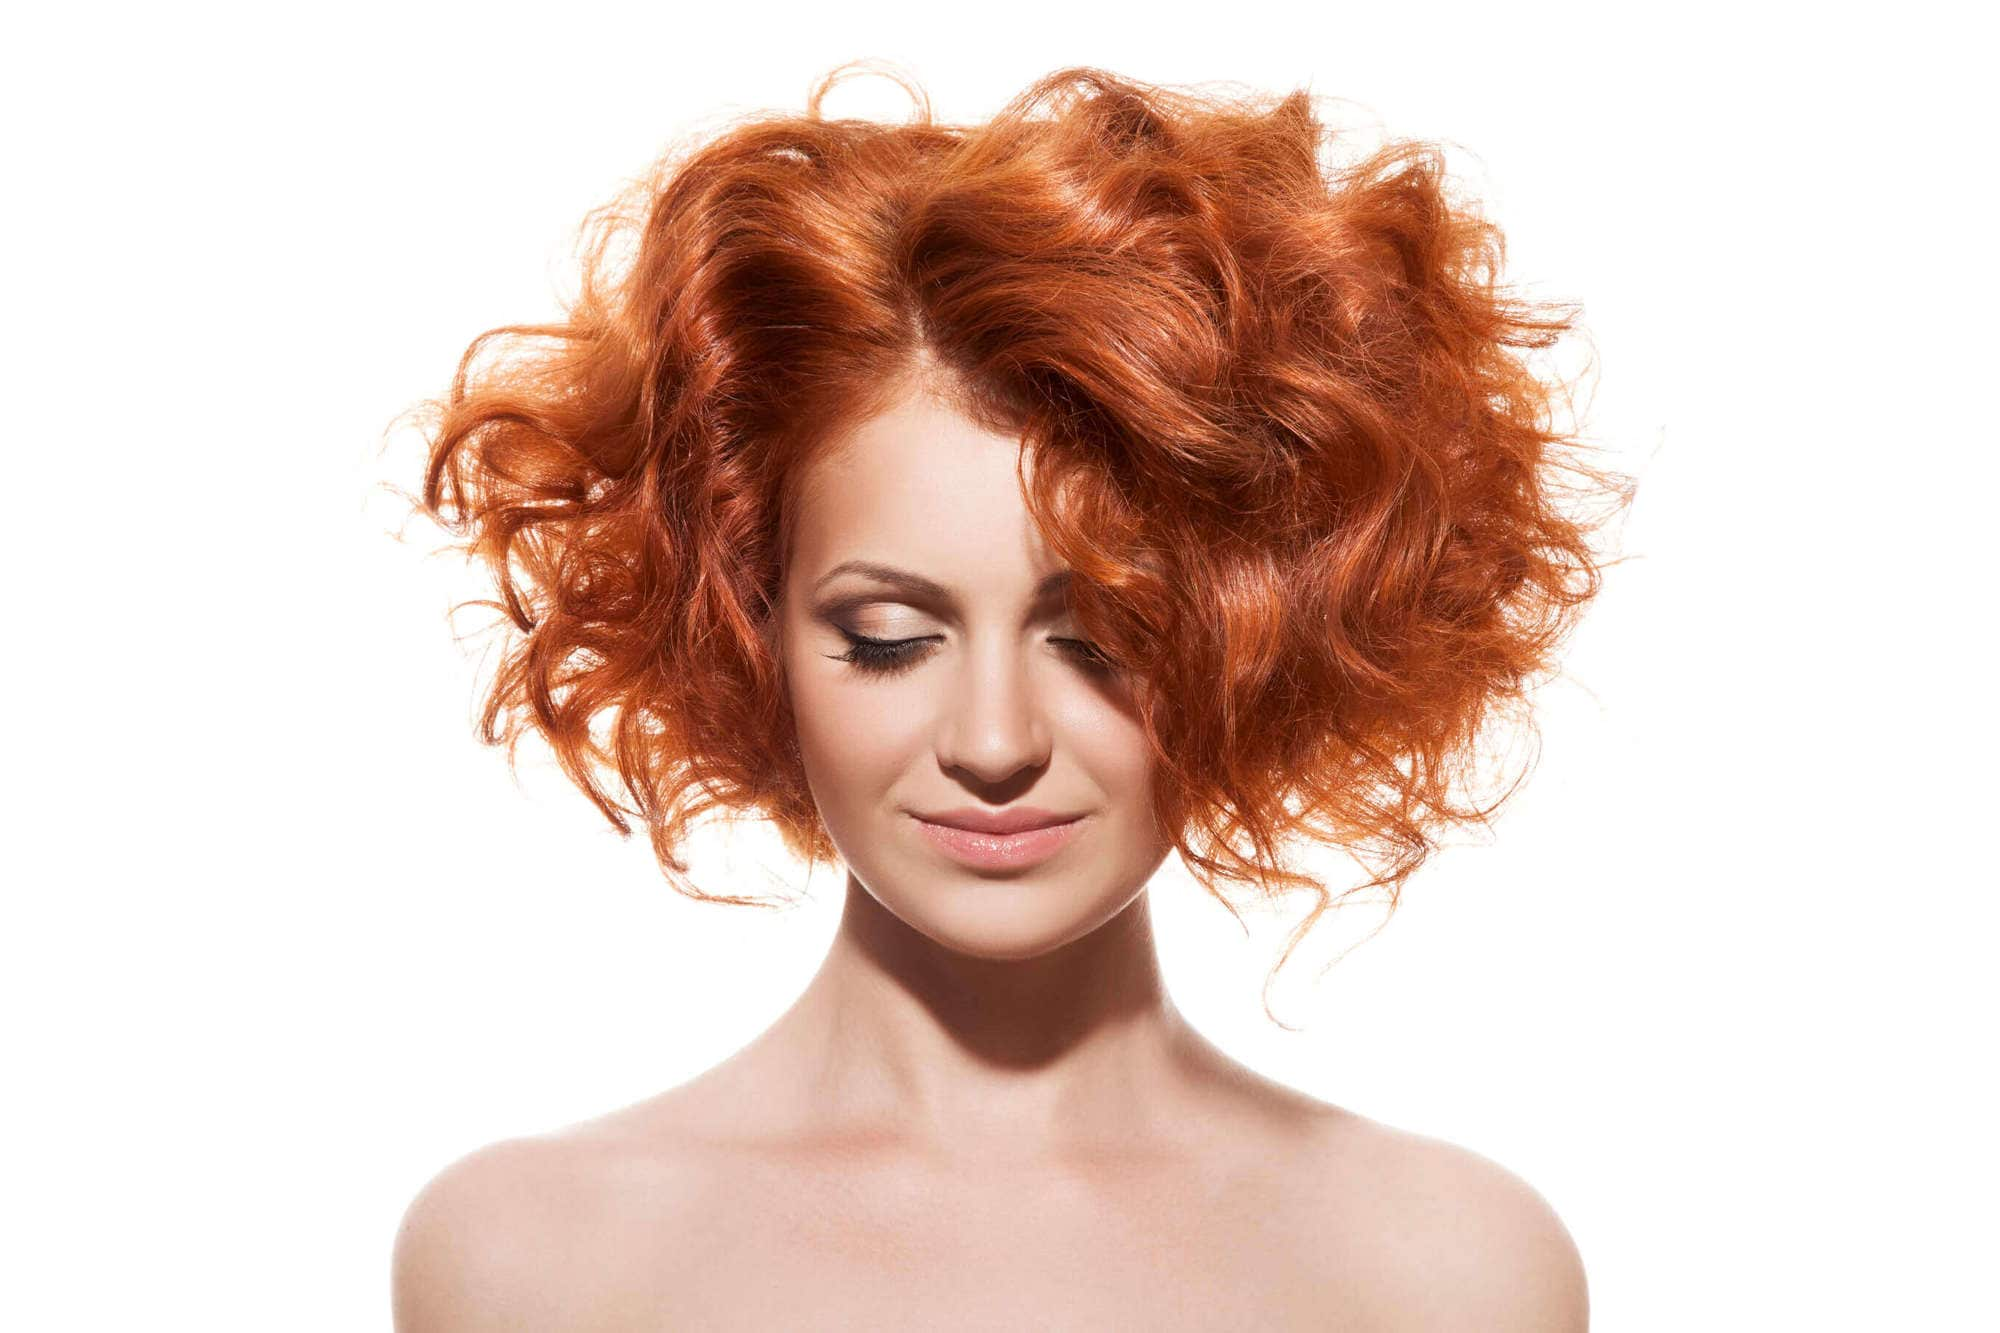 volumizing hairspray maximum volume on tousled hair